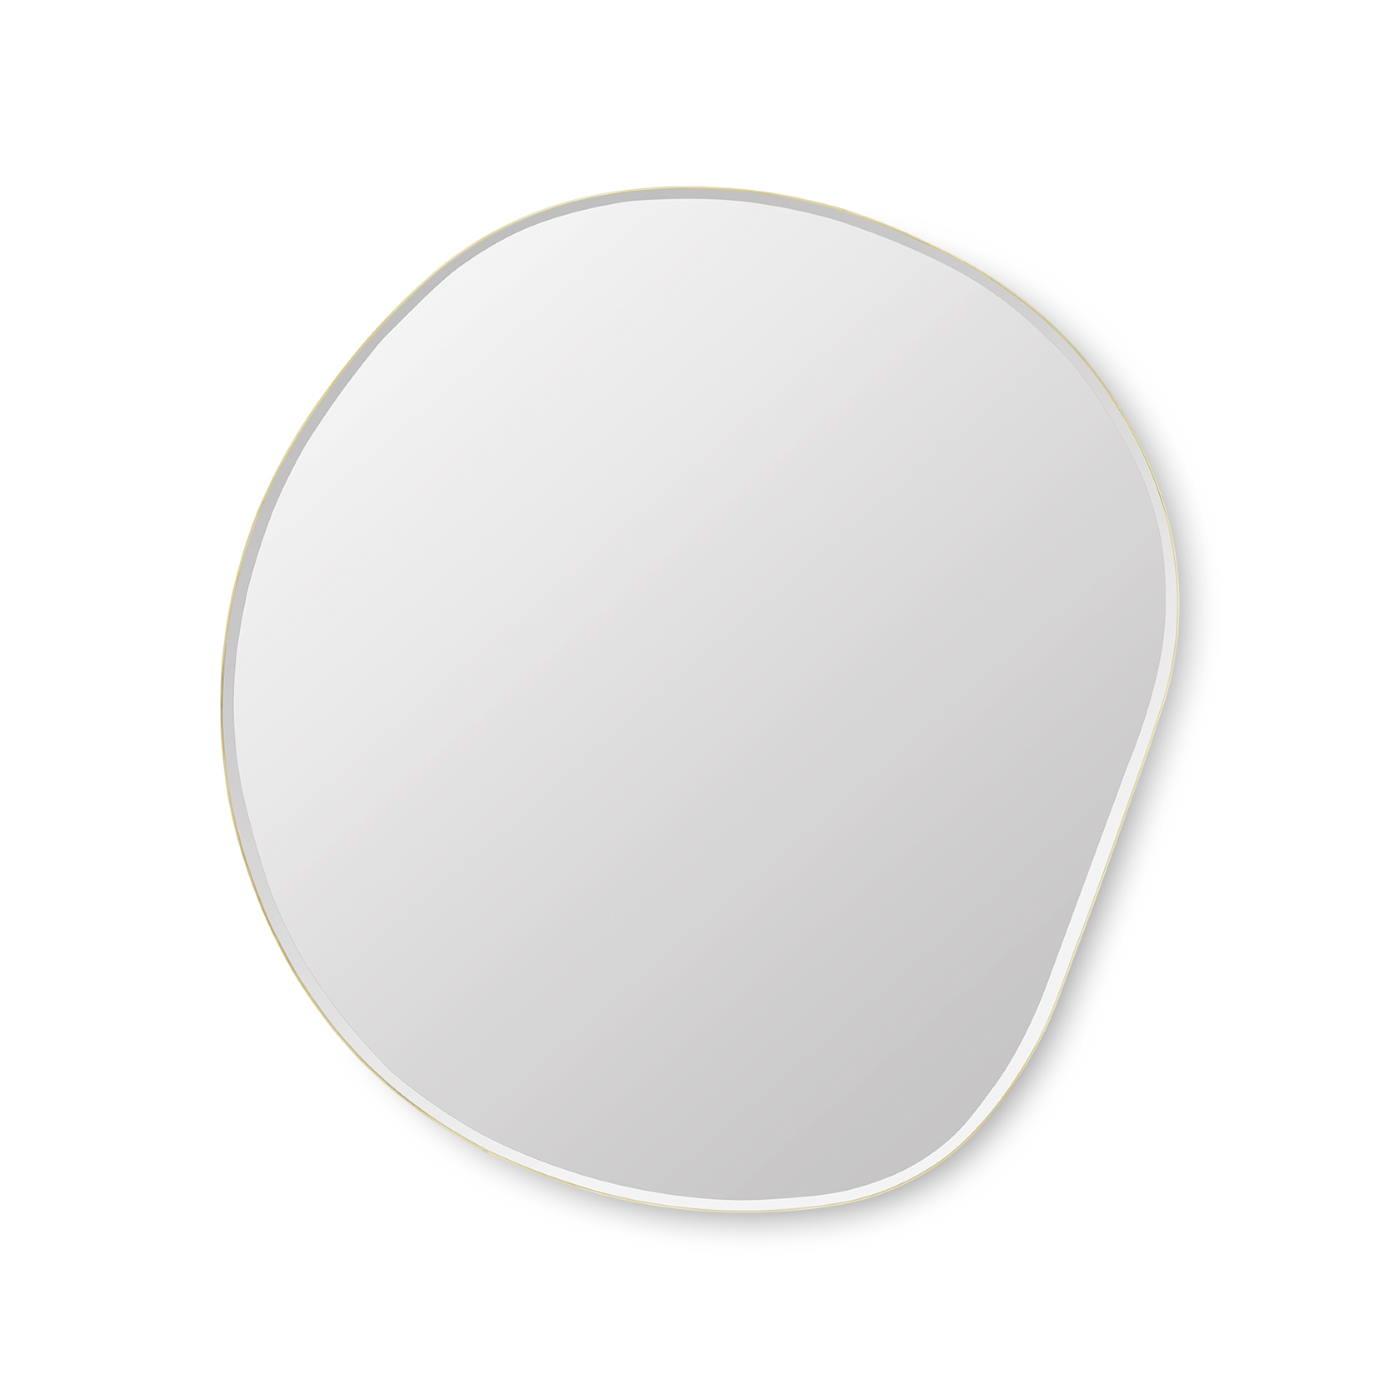 Pond Mirror XL Spegel Mässing Ferm Living